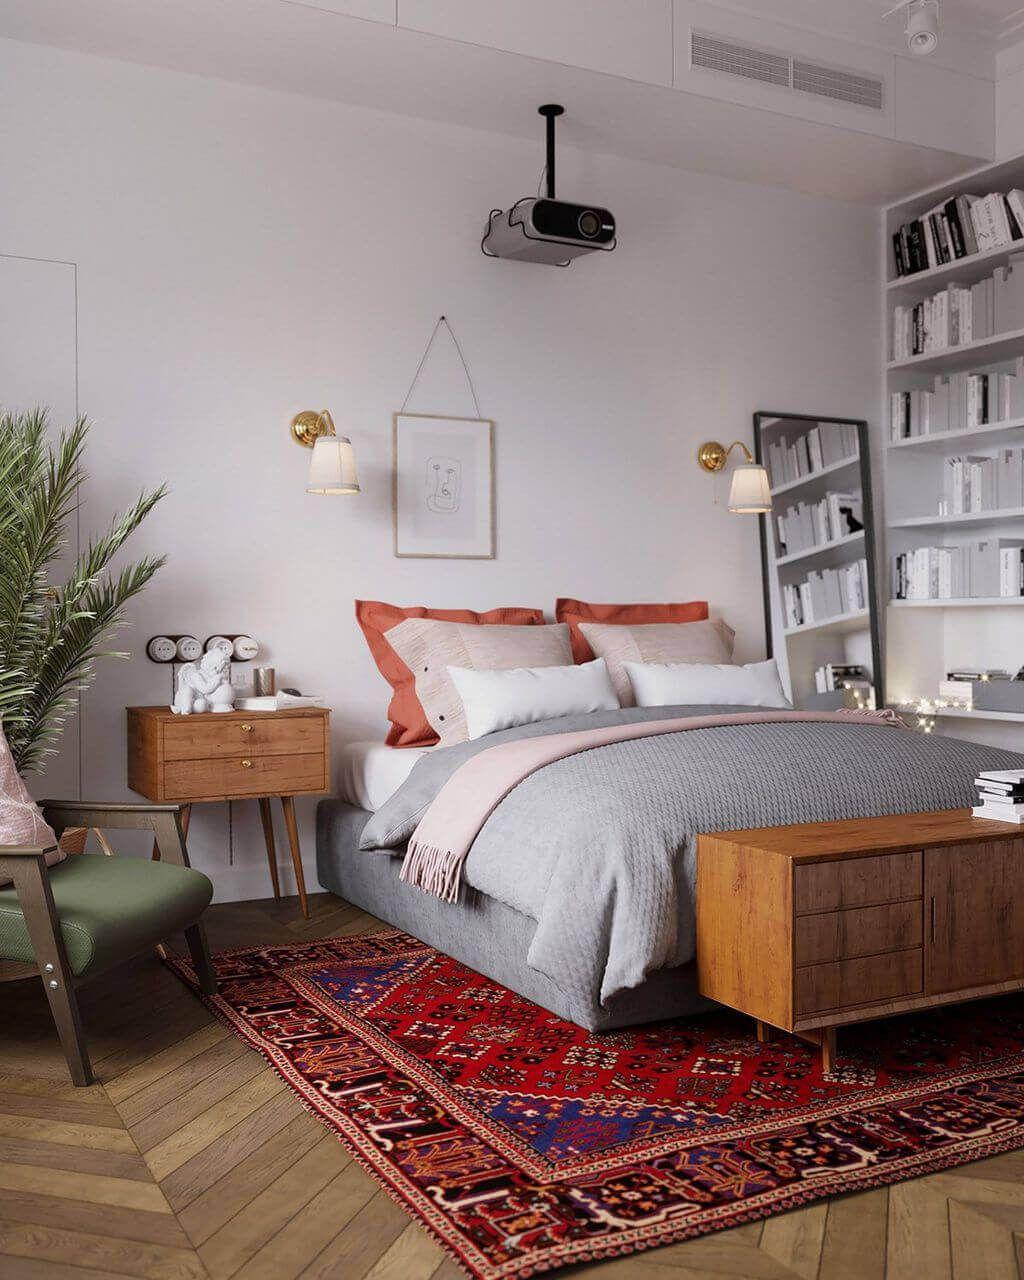 Scandinavian Interiordesign Colors: 30 Inspiring Scandinavian Interiors